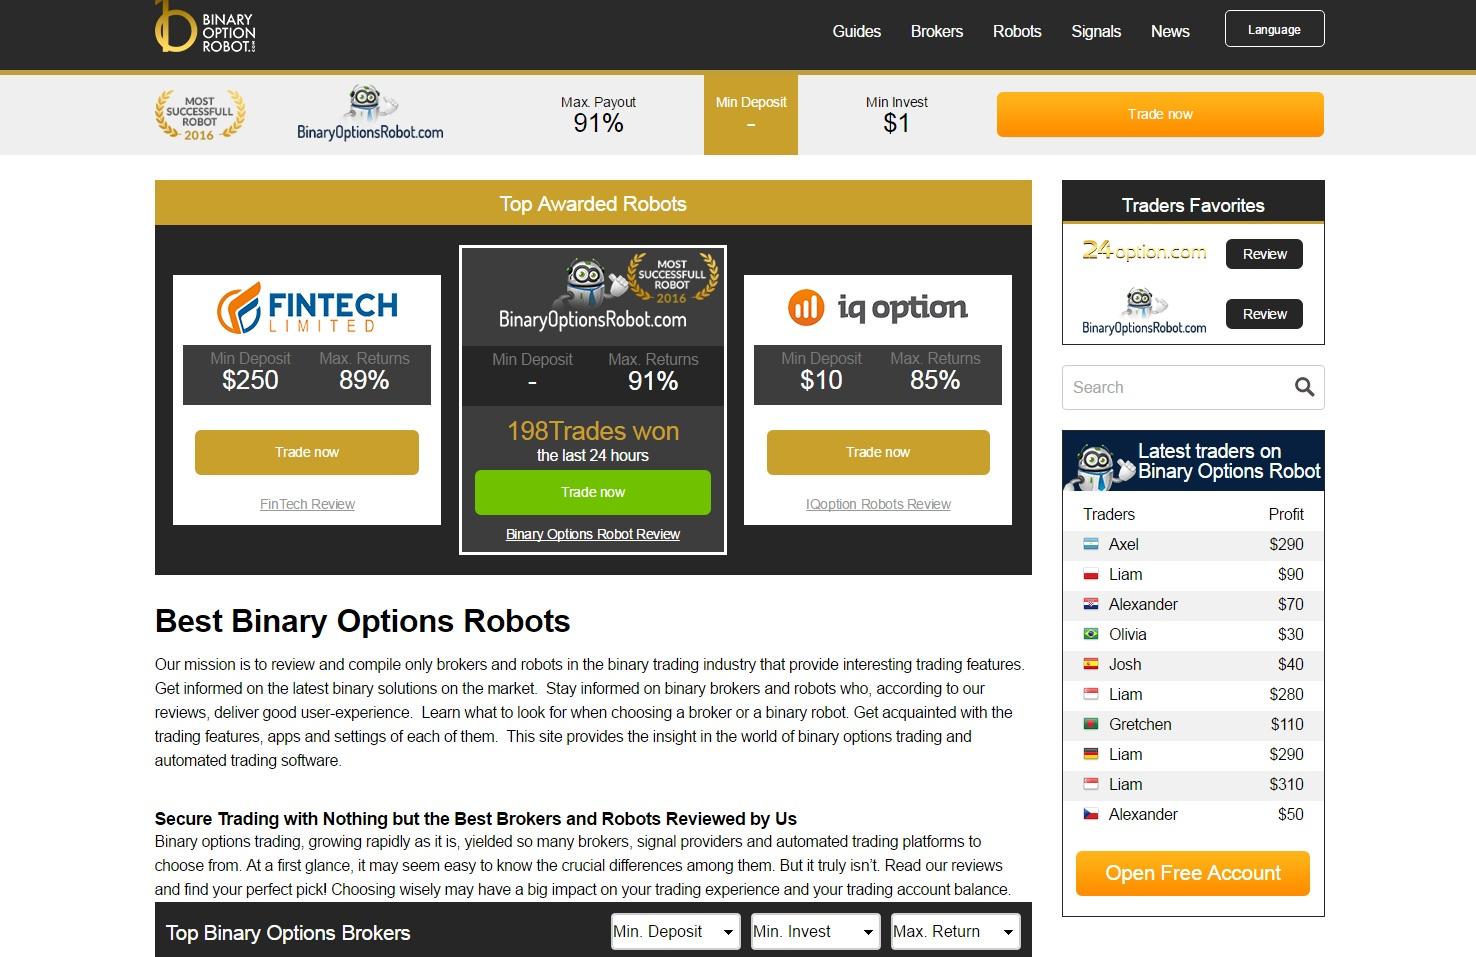 Robotul recenzie opțiuni binare